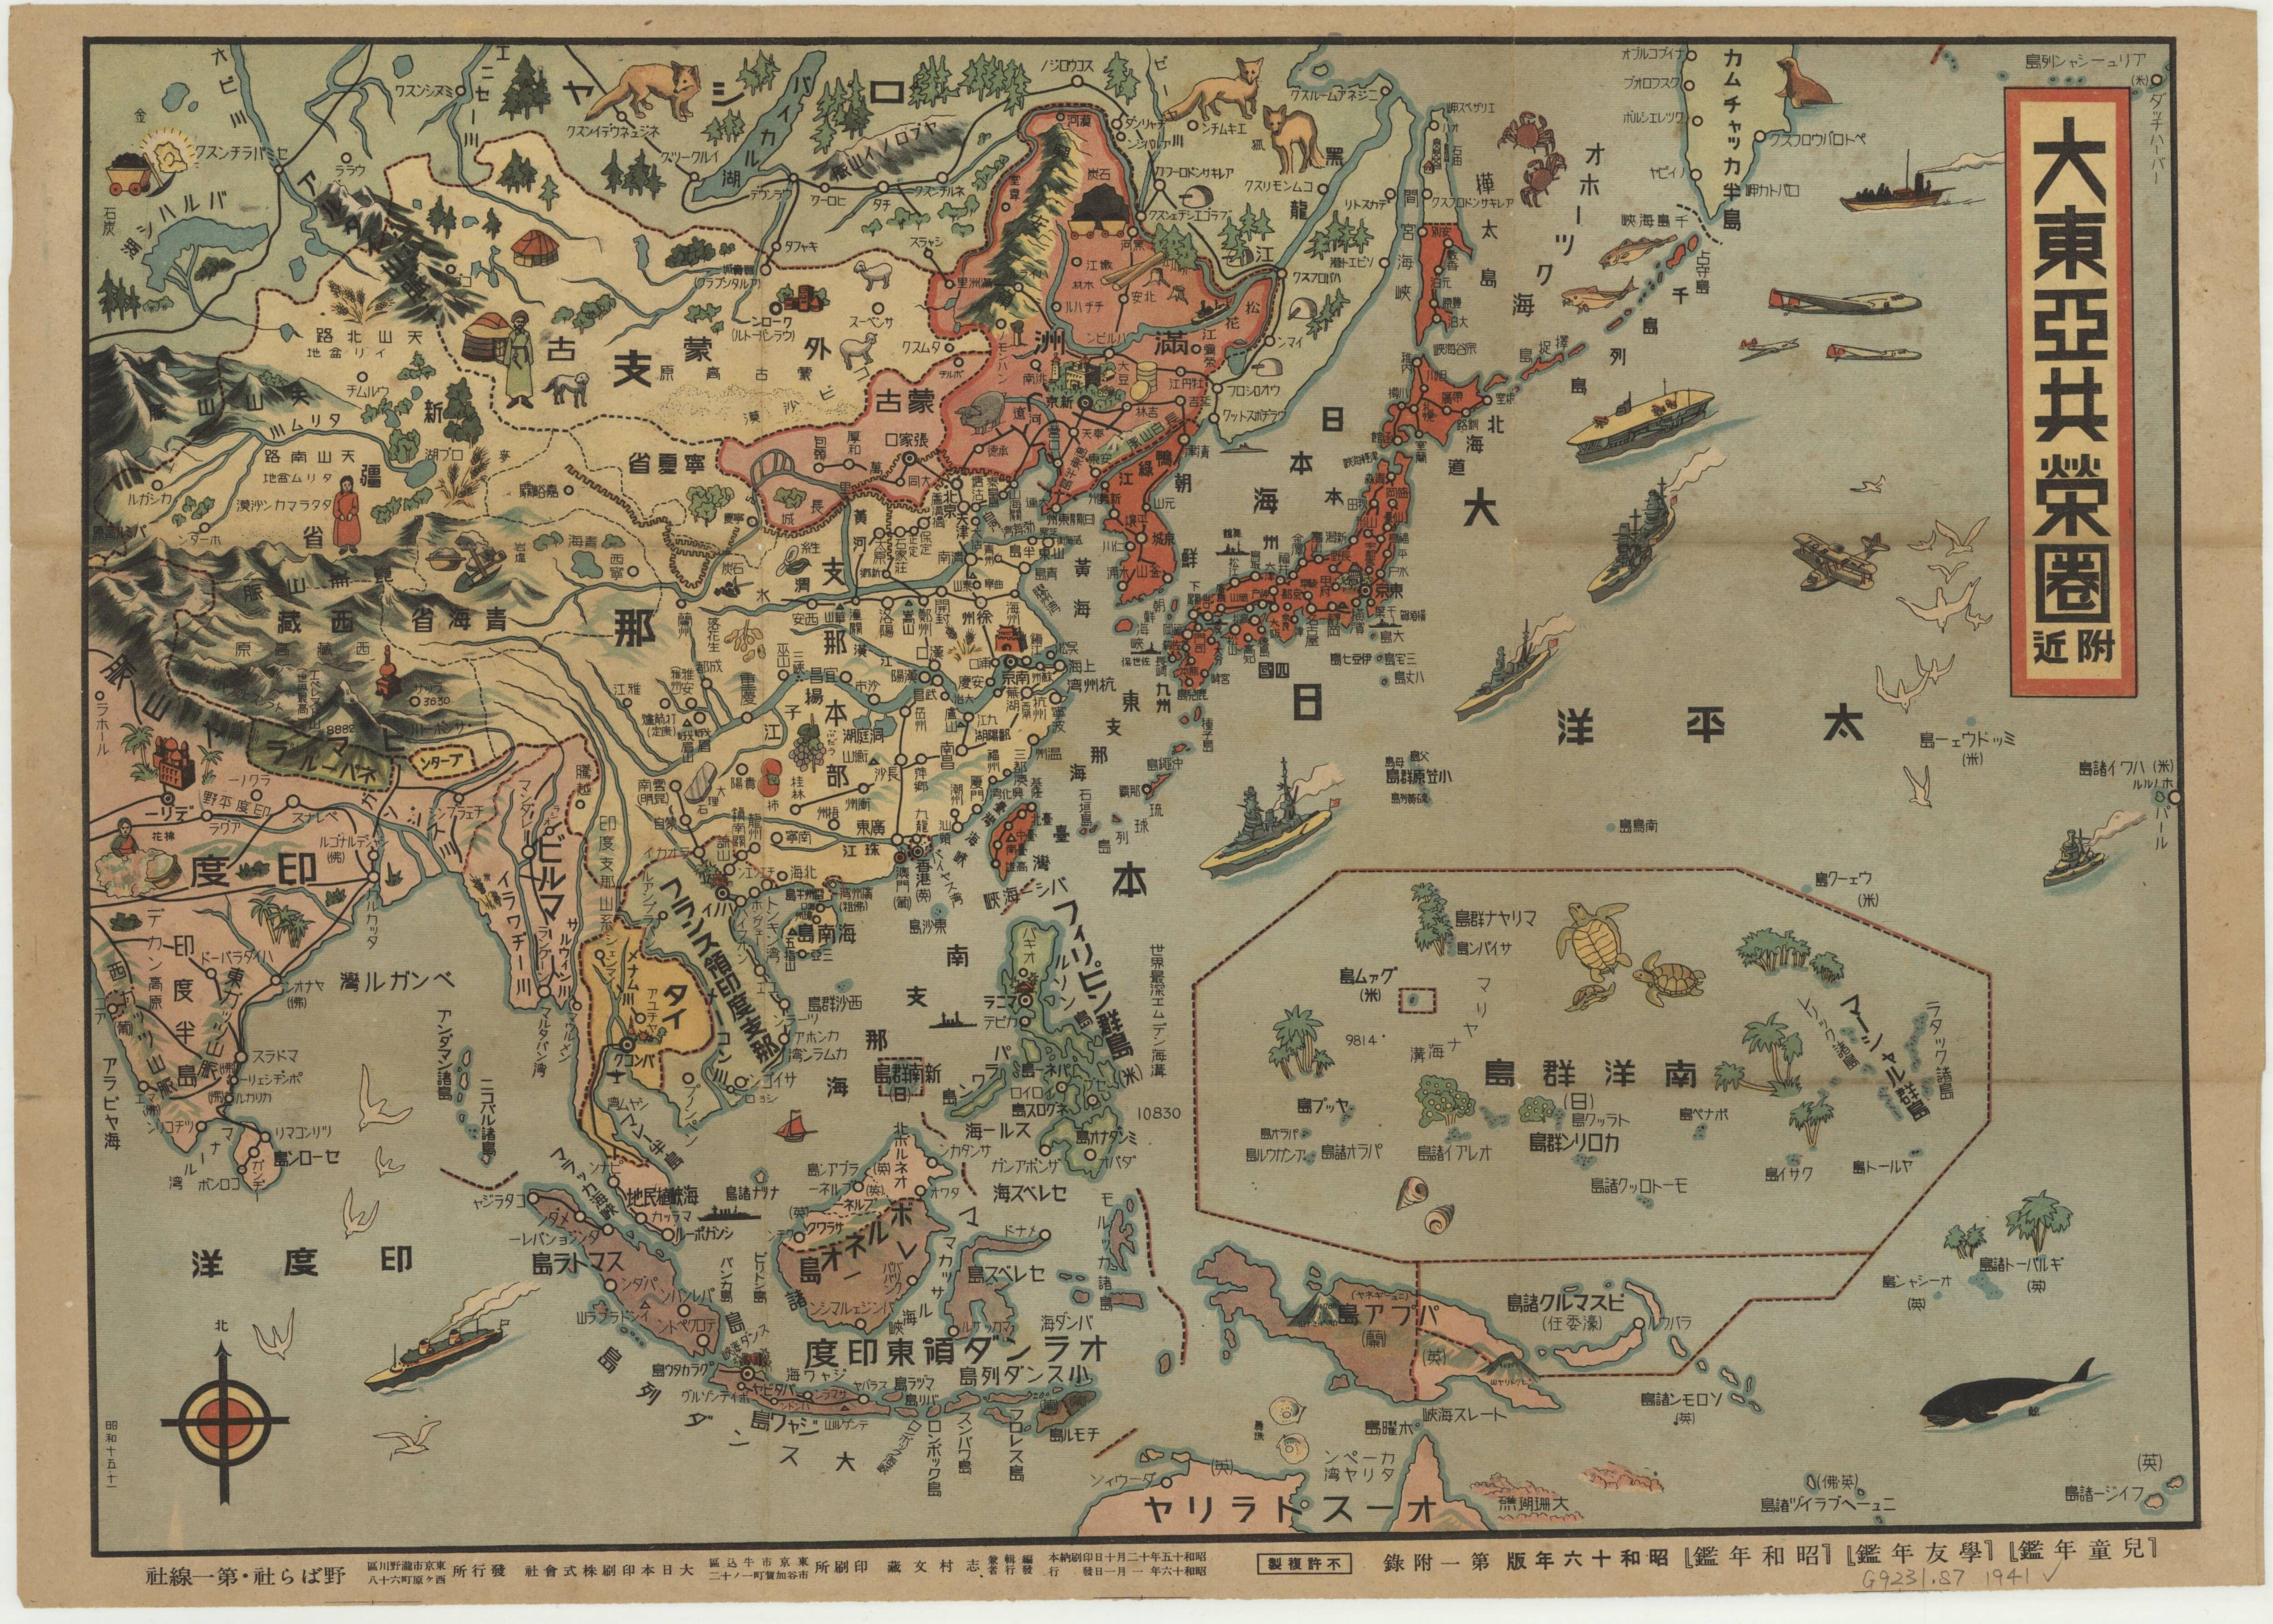 Dai Tōa Kyōeiken Fukin 大東亜共栄圏附近 1941 Pictorial Map Of - Denver Circled On Us Map